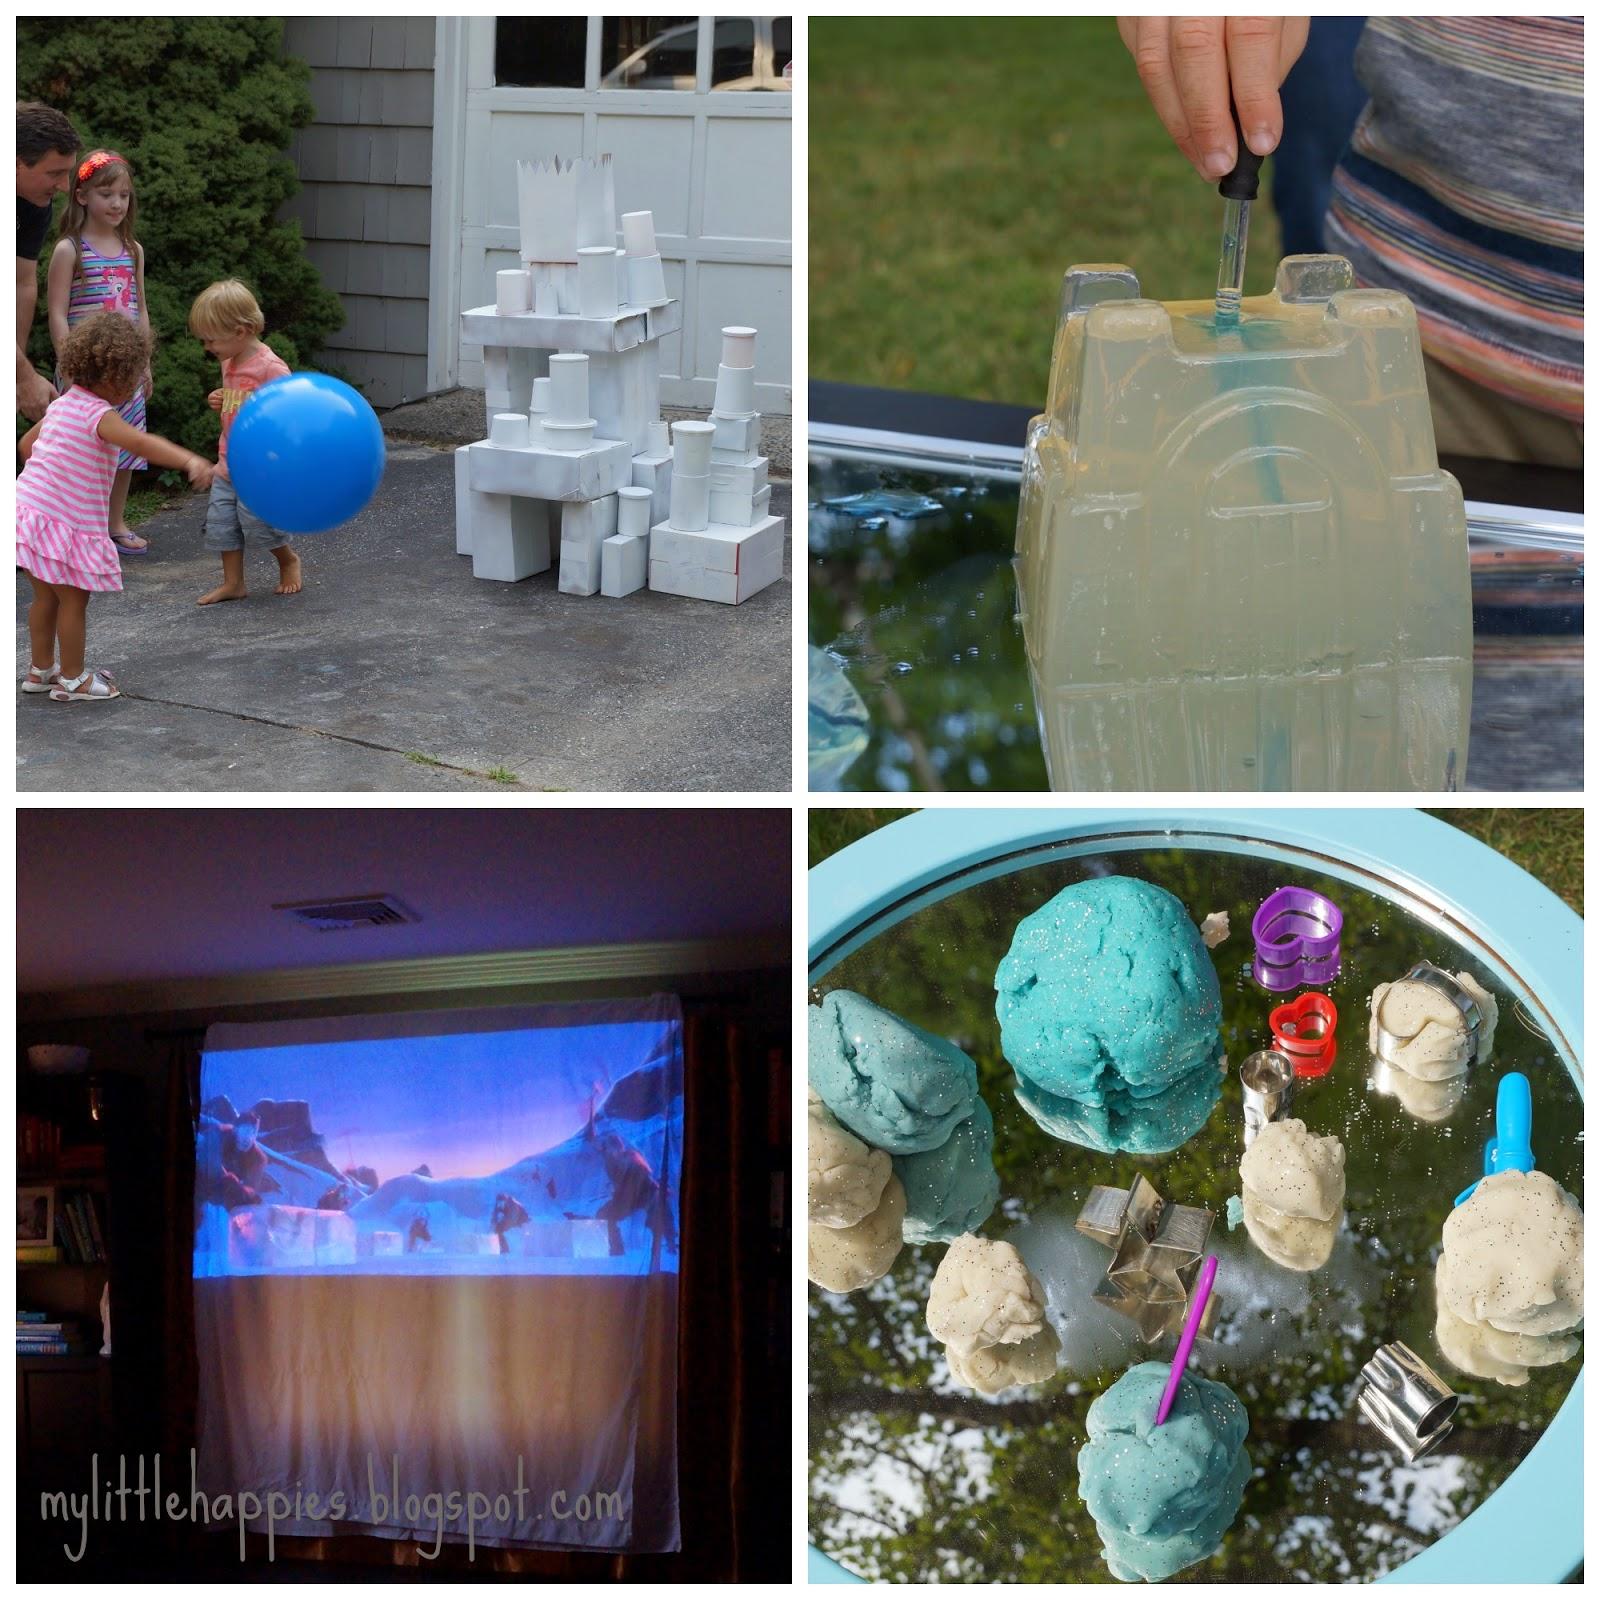 Astounding Little Happies Frozen Fun Inspired Art Sensory Camp Machost Co Dining Chair Design Ideas Machostcouk